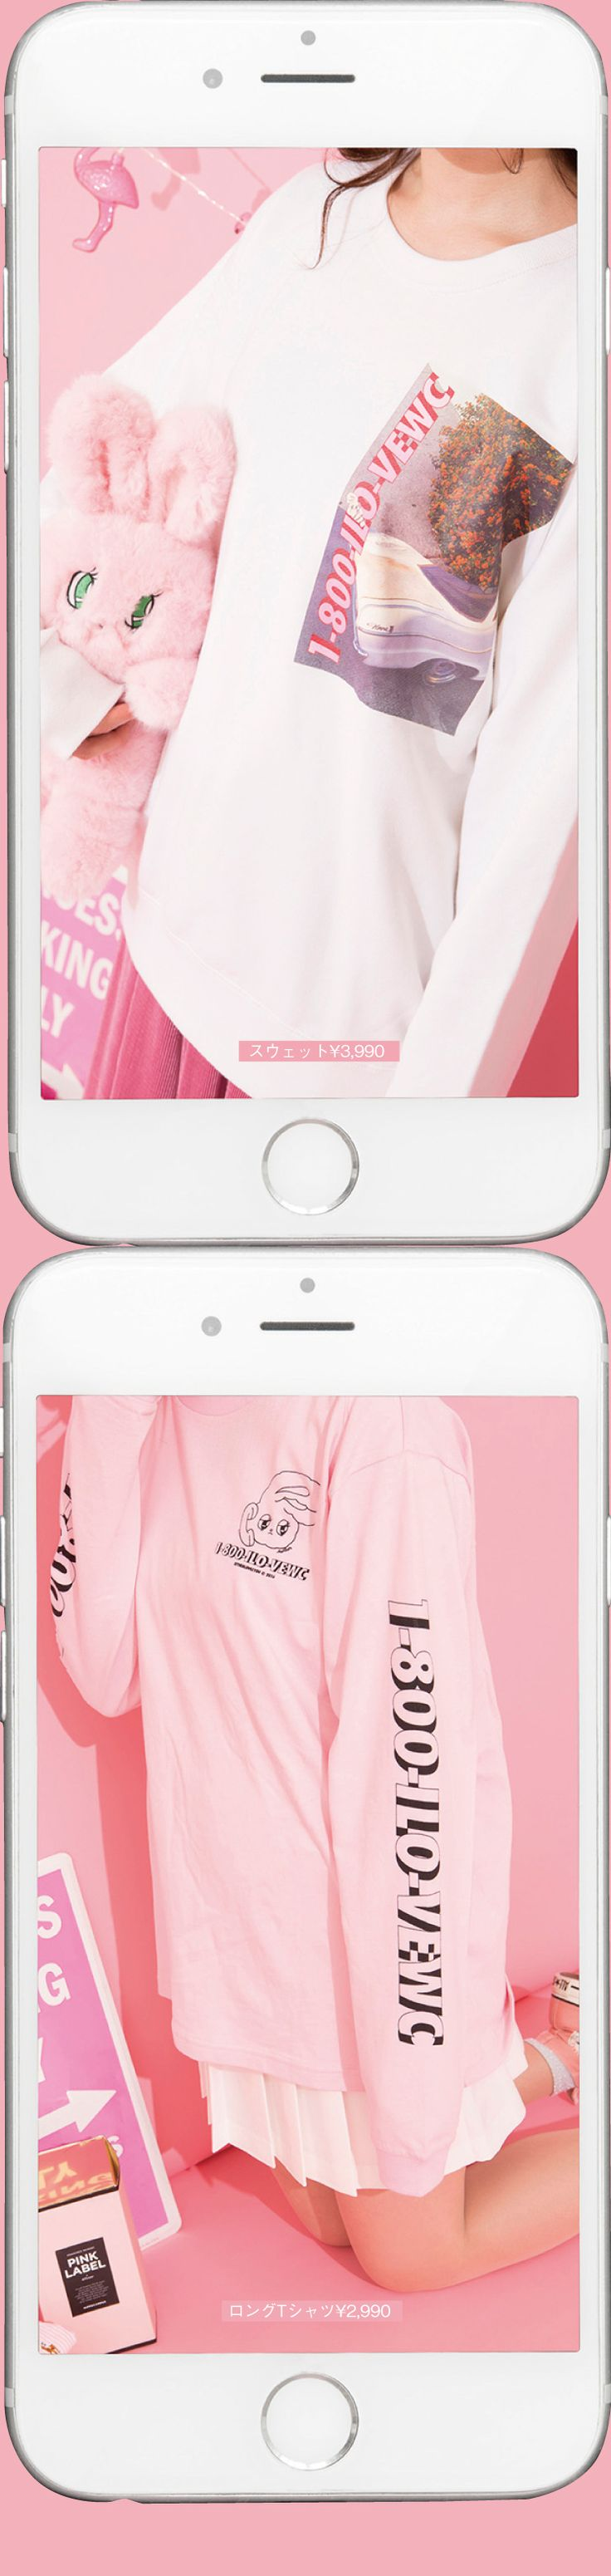 MONTHLY GUIDE 12 | ファッション通販サイトのGOCART ONLINE SHOP [ゴーカート オンラインショップ]